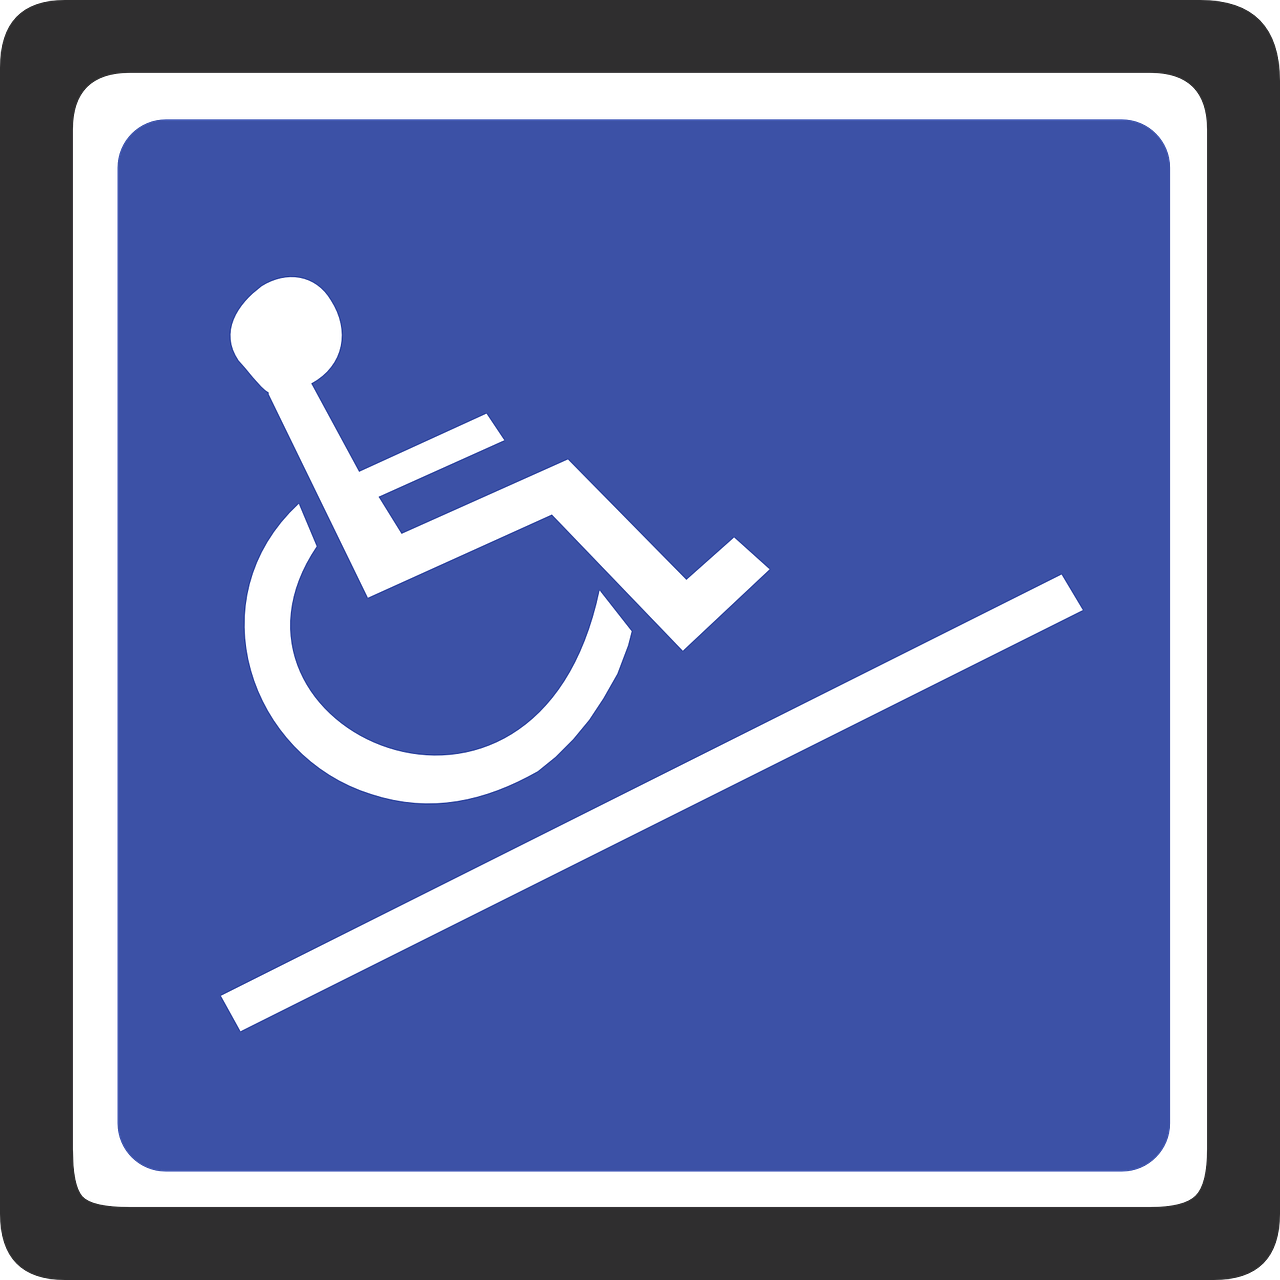 Sanne Willems Zorg ervaring instelling gehandicaptenzorg verstandelijk gehandicapten